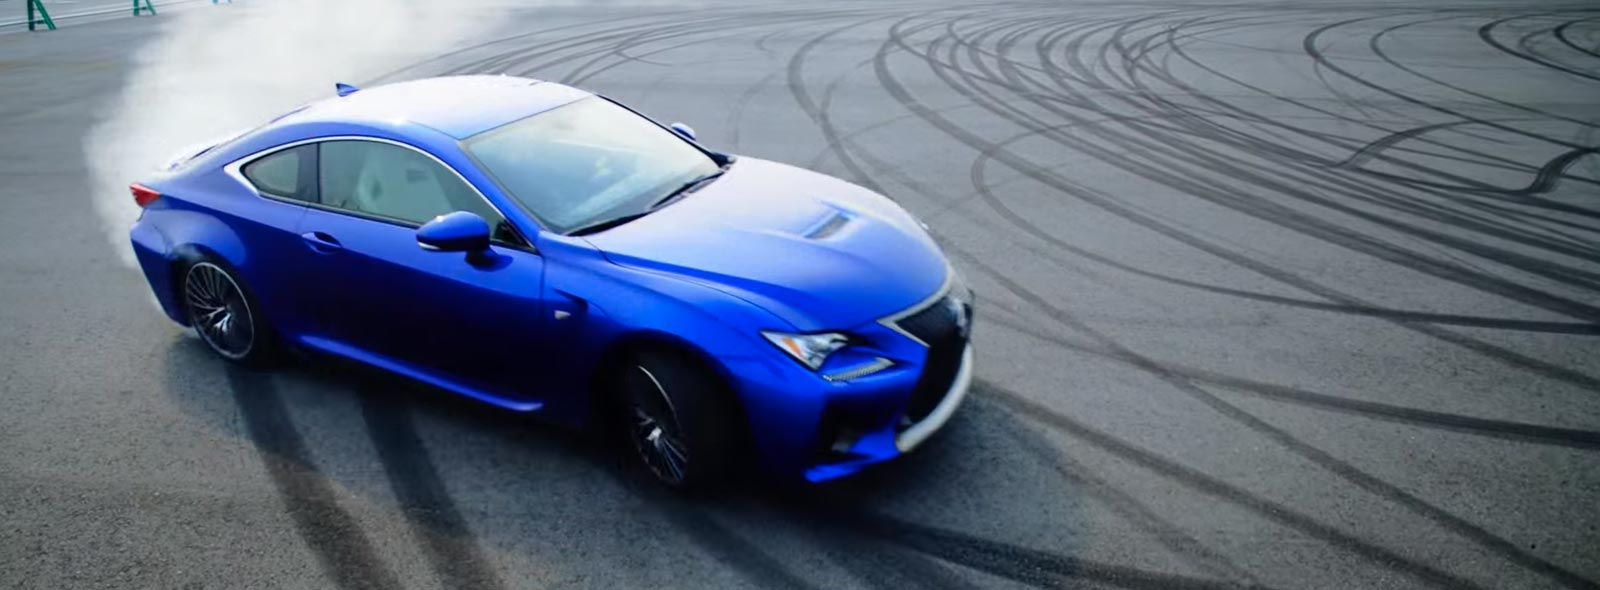 Videobild Lexus RC F burnout